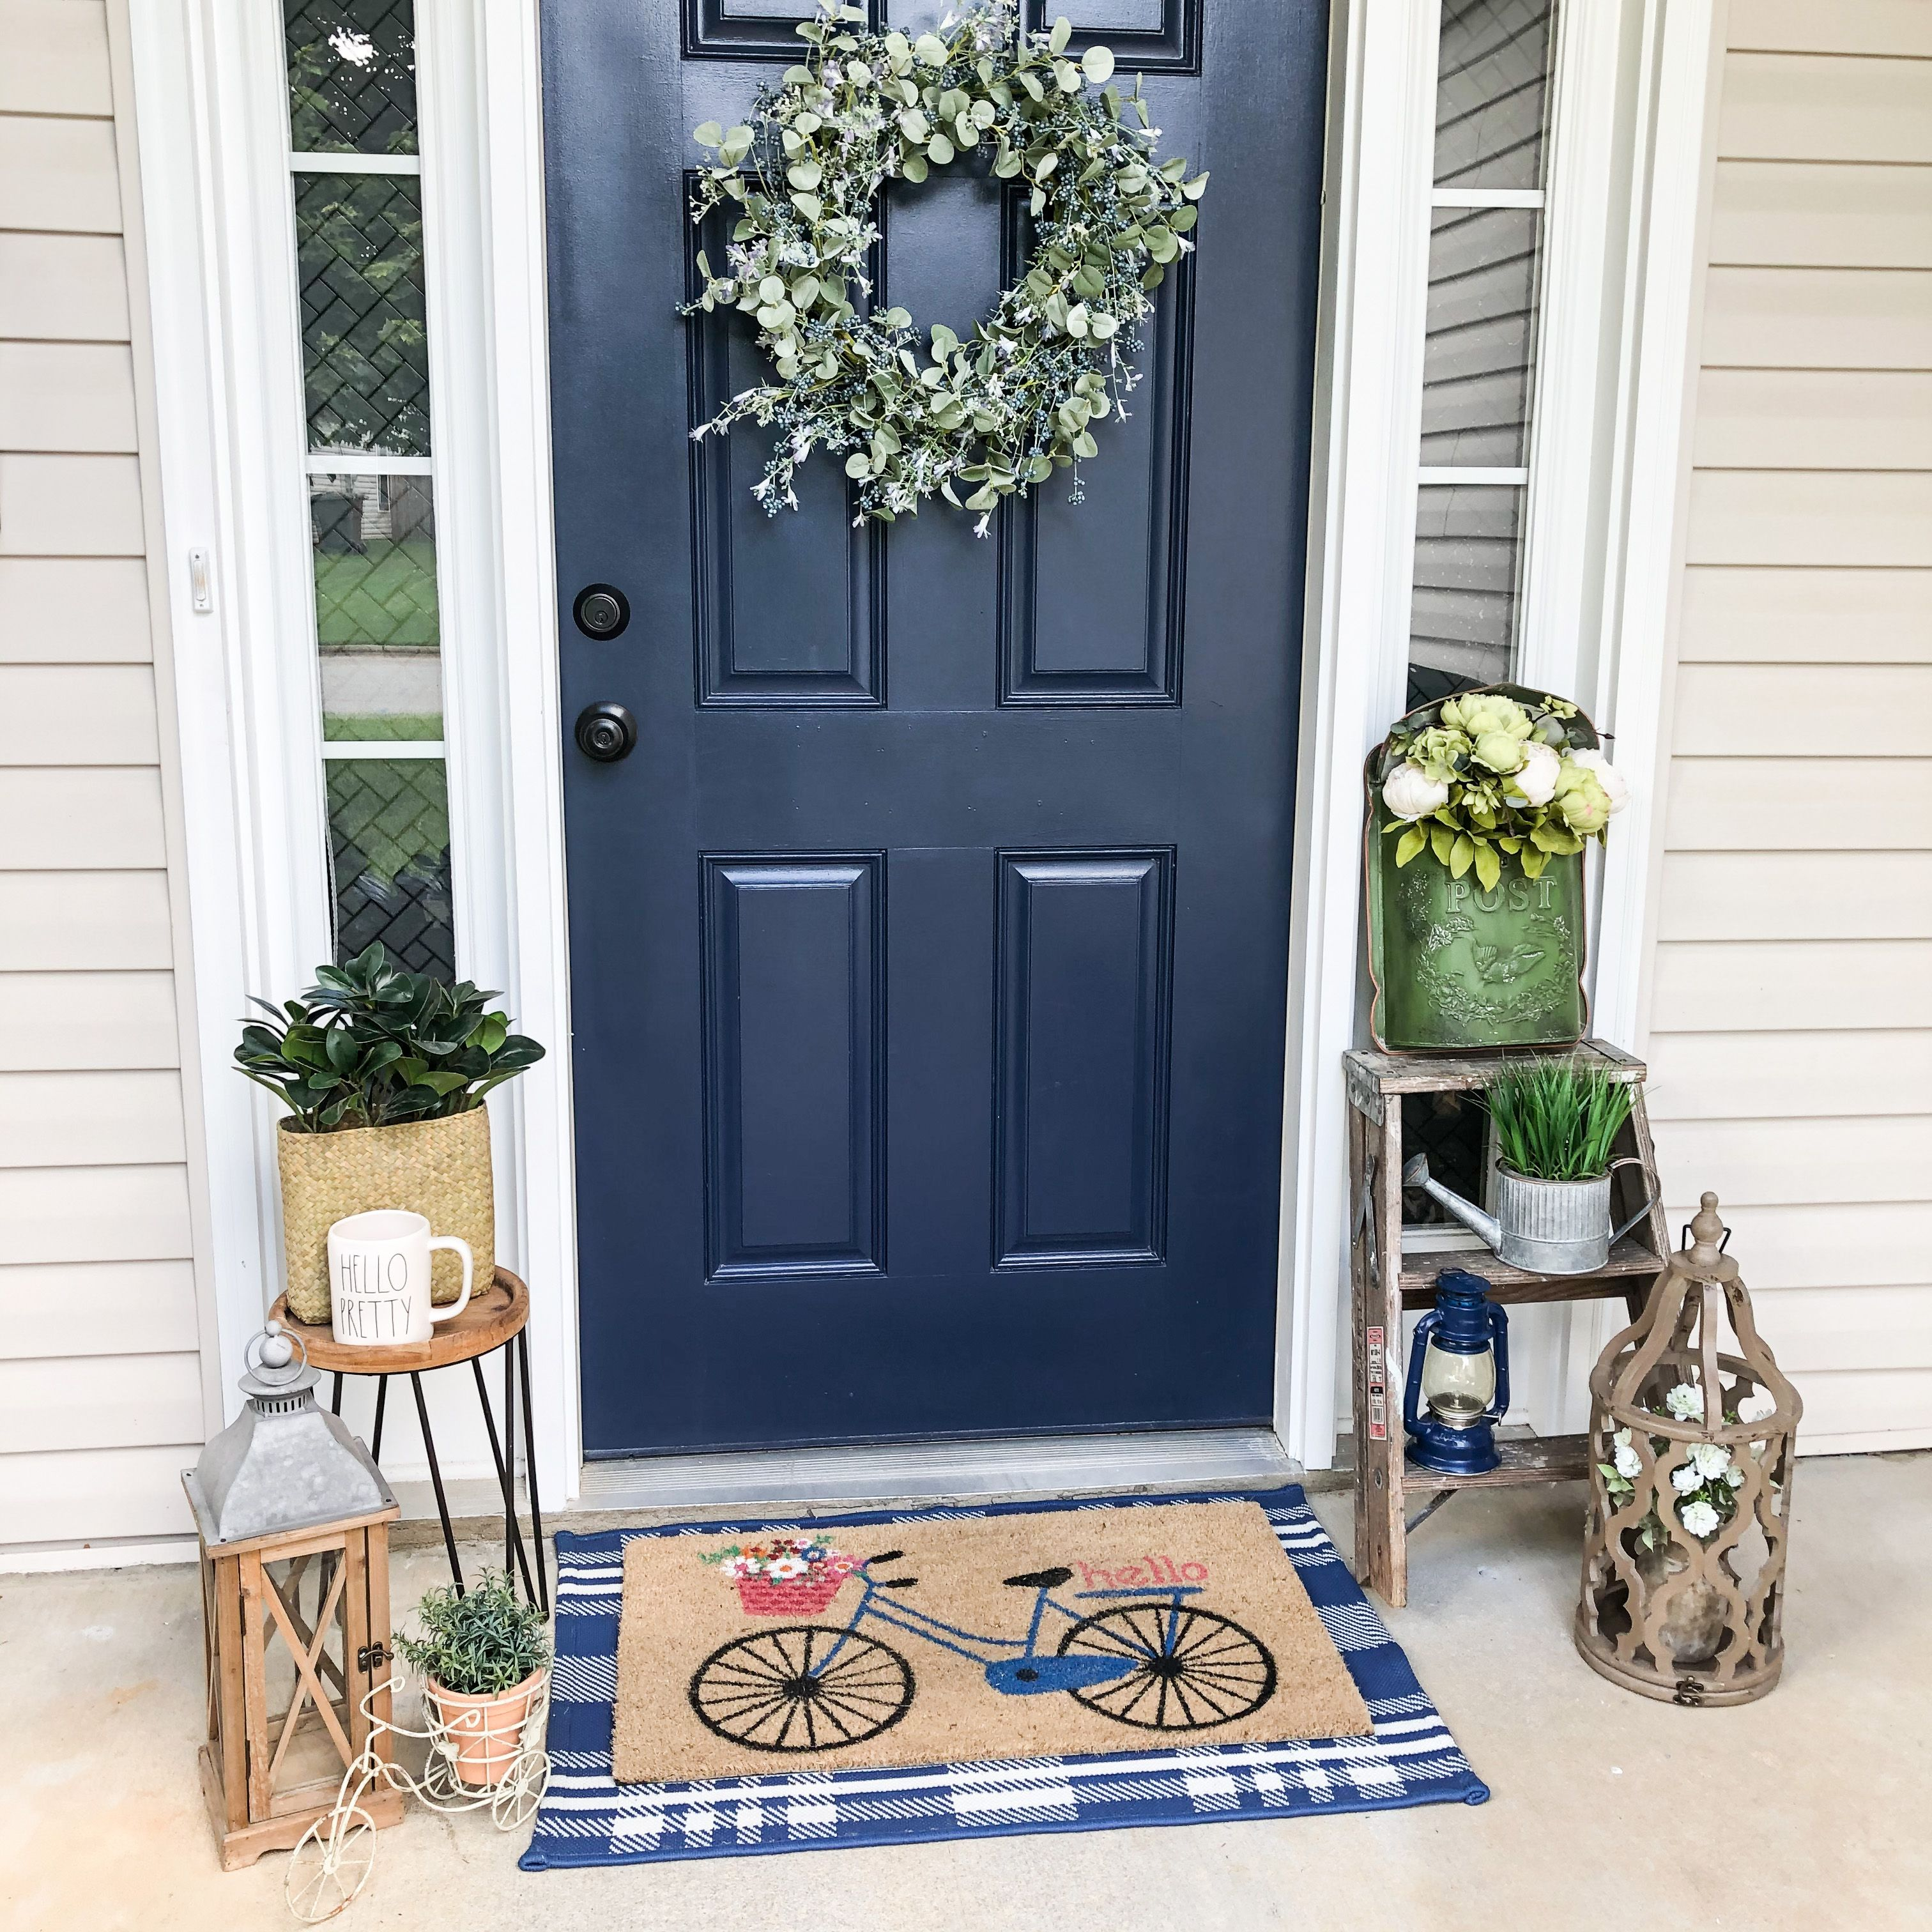 #porchdecor #outdoordecorations #bluefrontdoor #farmhousestyle #layereddoormats #lanternshomedecor #ladderdecor #fauxplants #exteriordecor